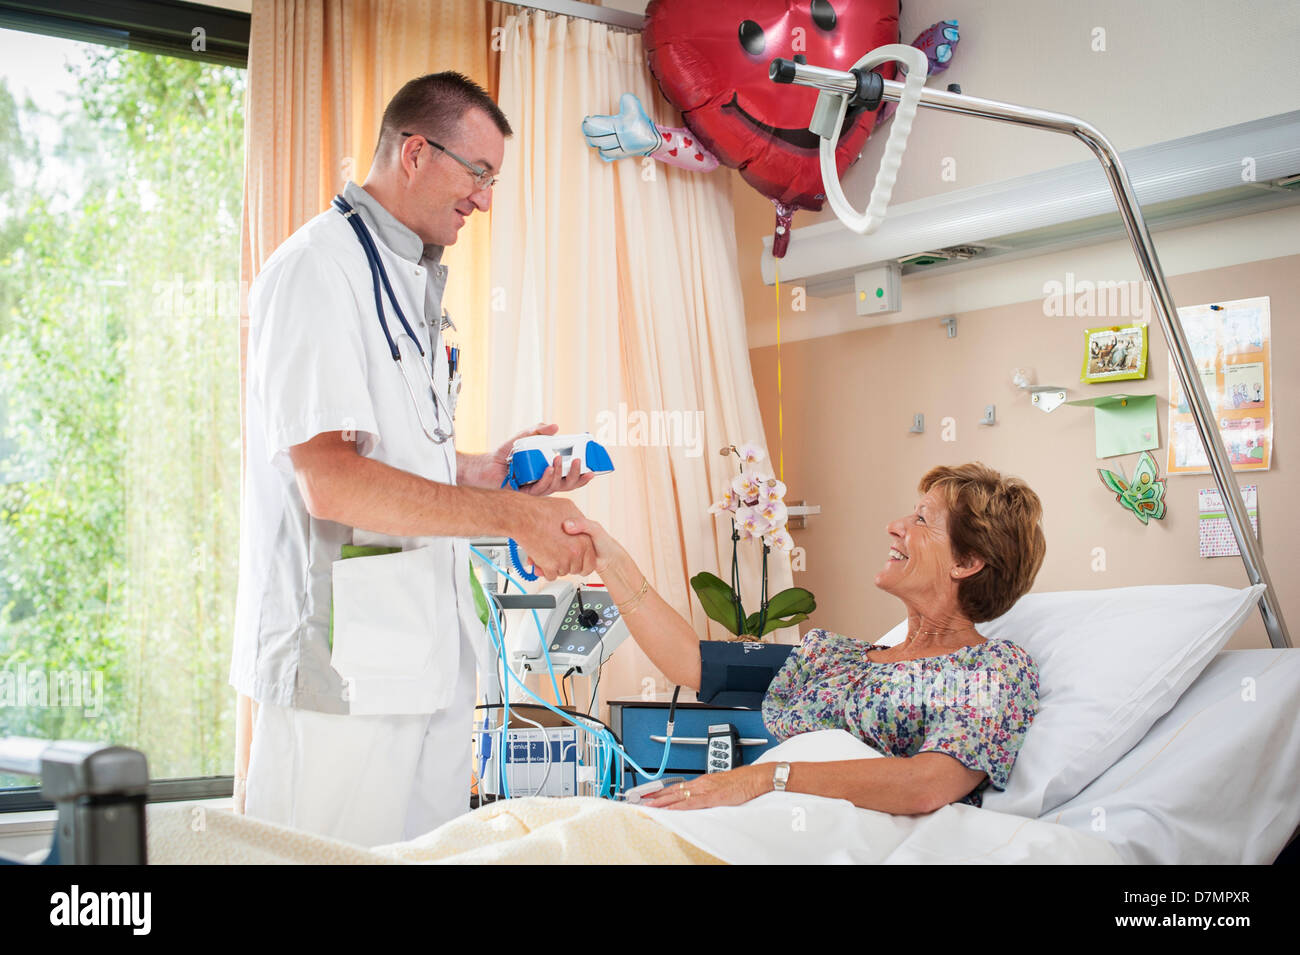 Blood pressure measurement - Stock Image